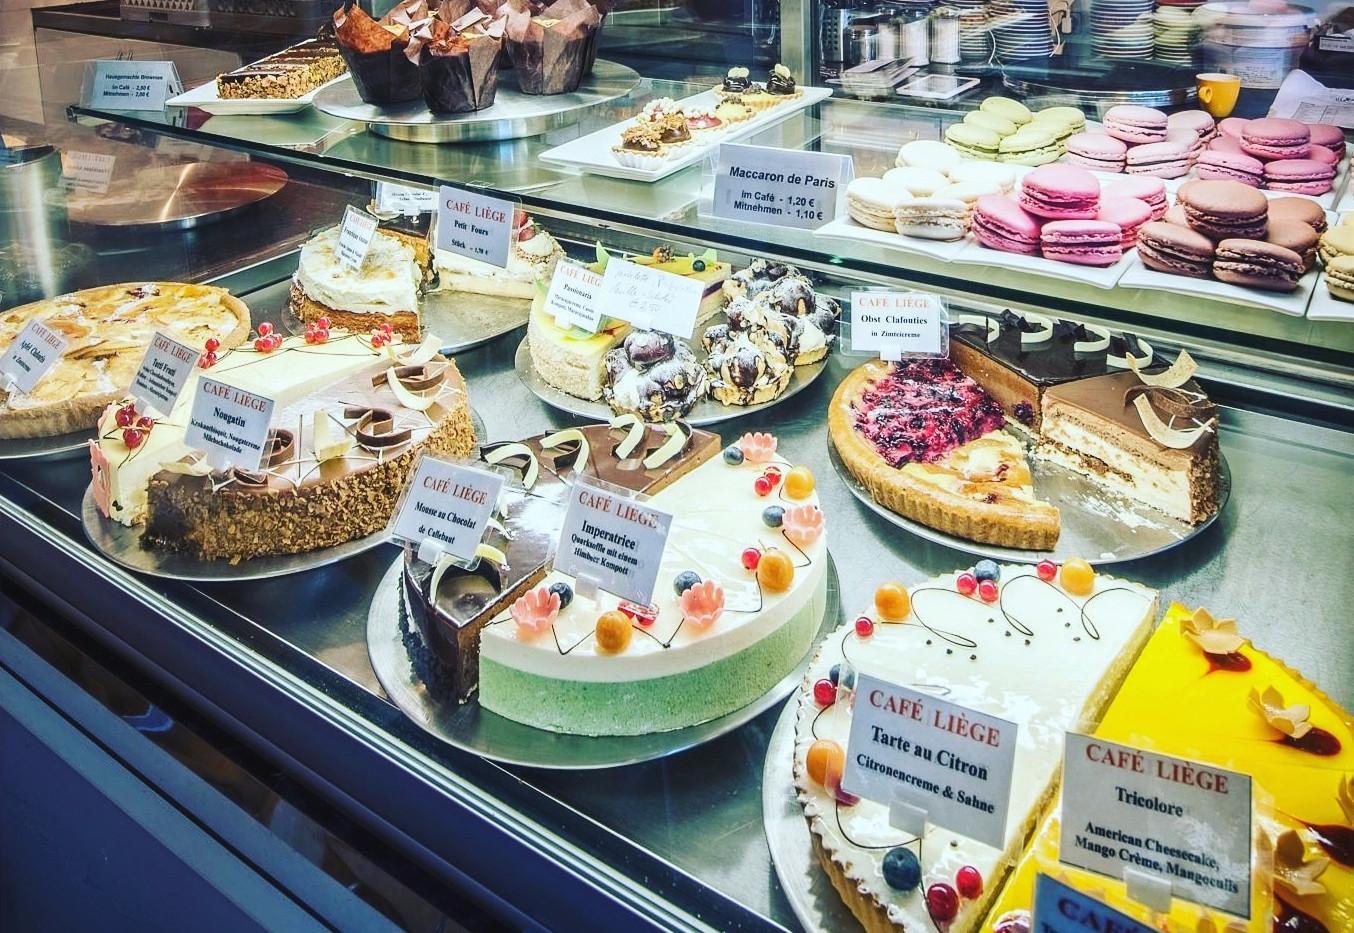 cafe-liege-aachen-am-dom-torten-kuchen-theke.jpg